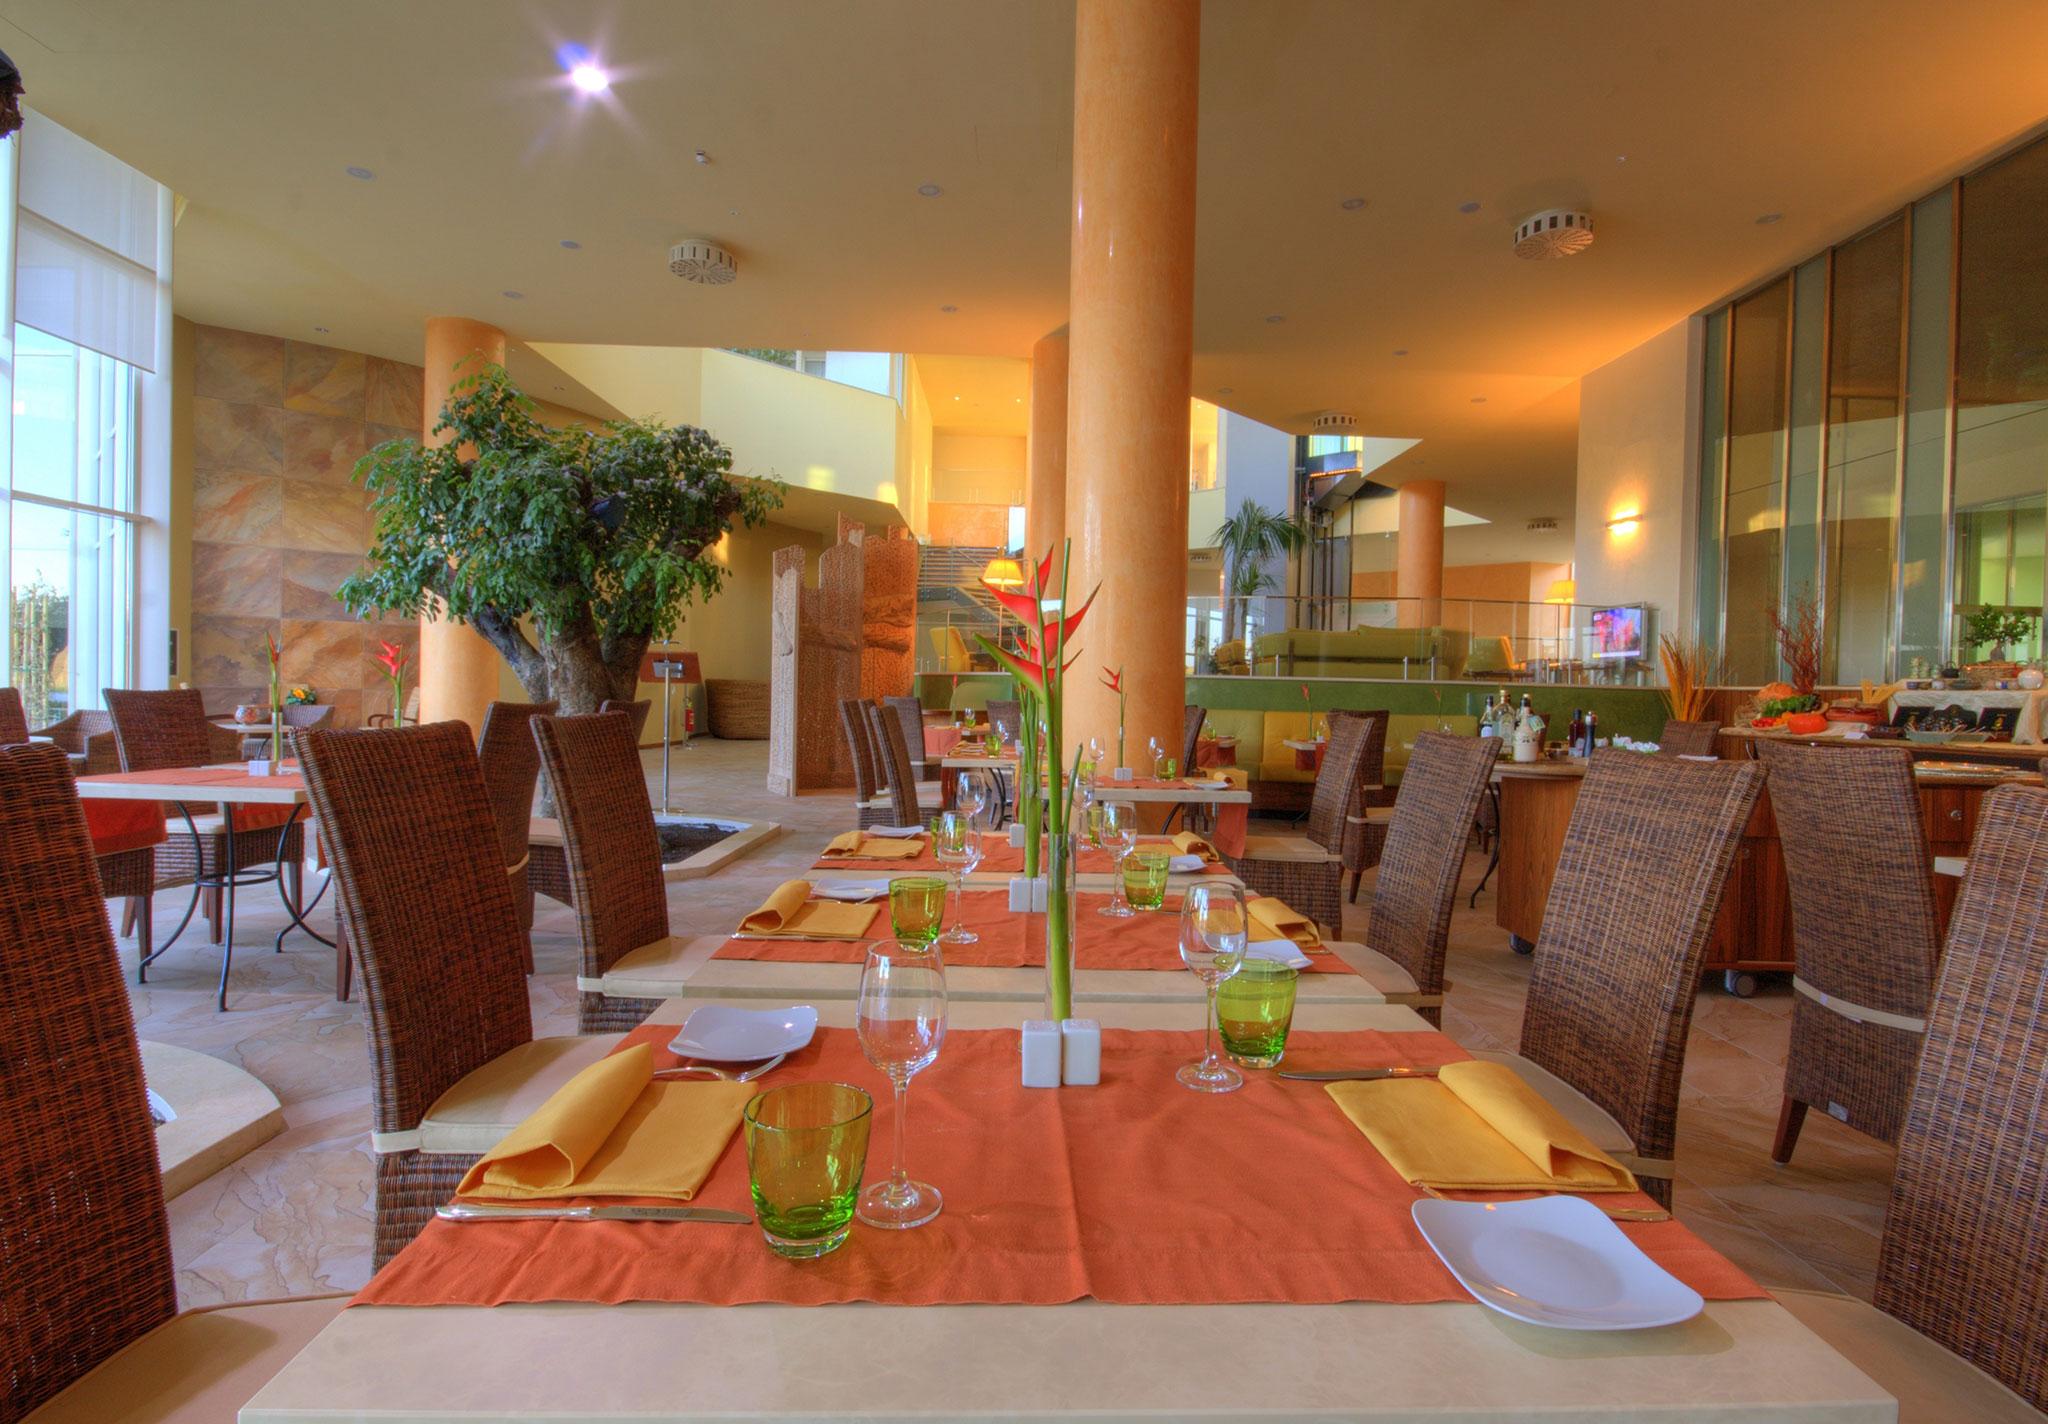 Hilton hotels resorts italia - Hotel due giardini milan italy ...